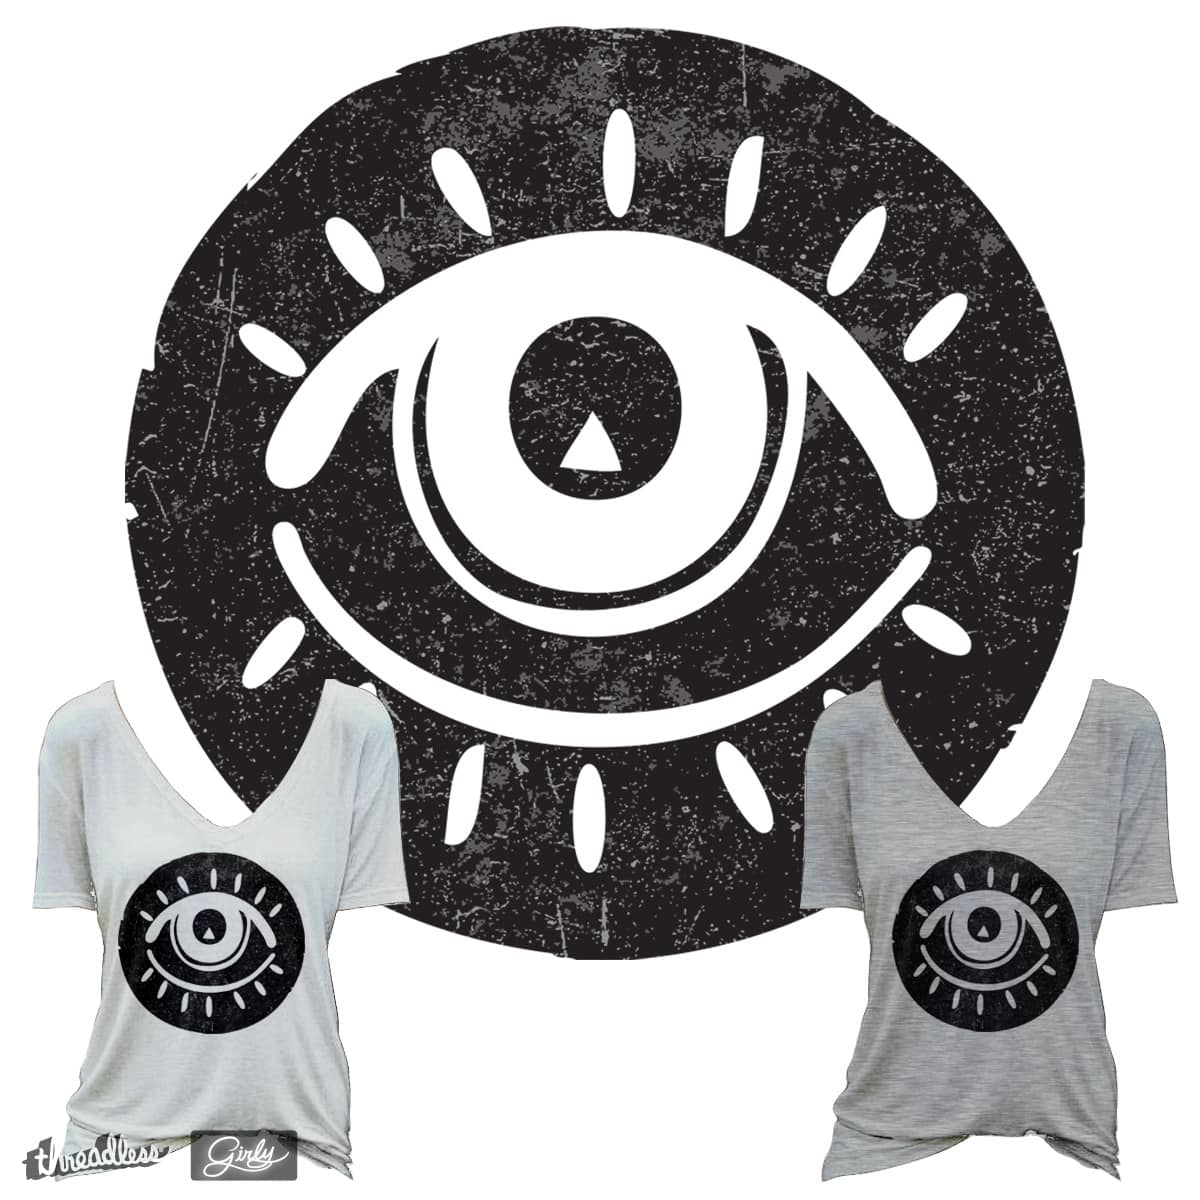 Eye See You by JackieFarkas on Threadless